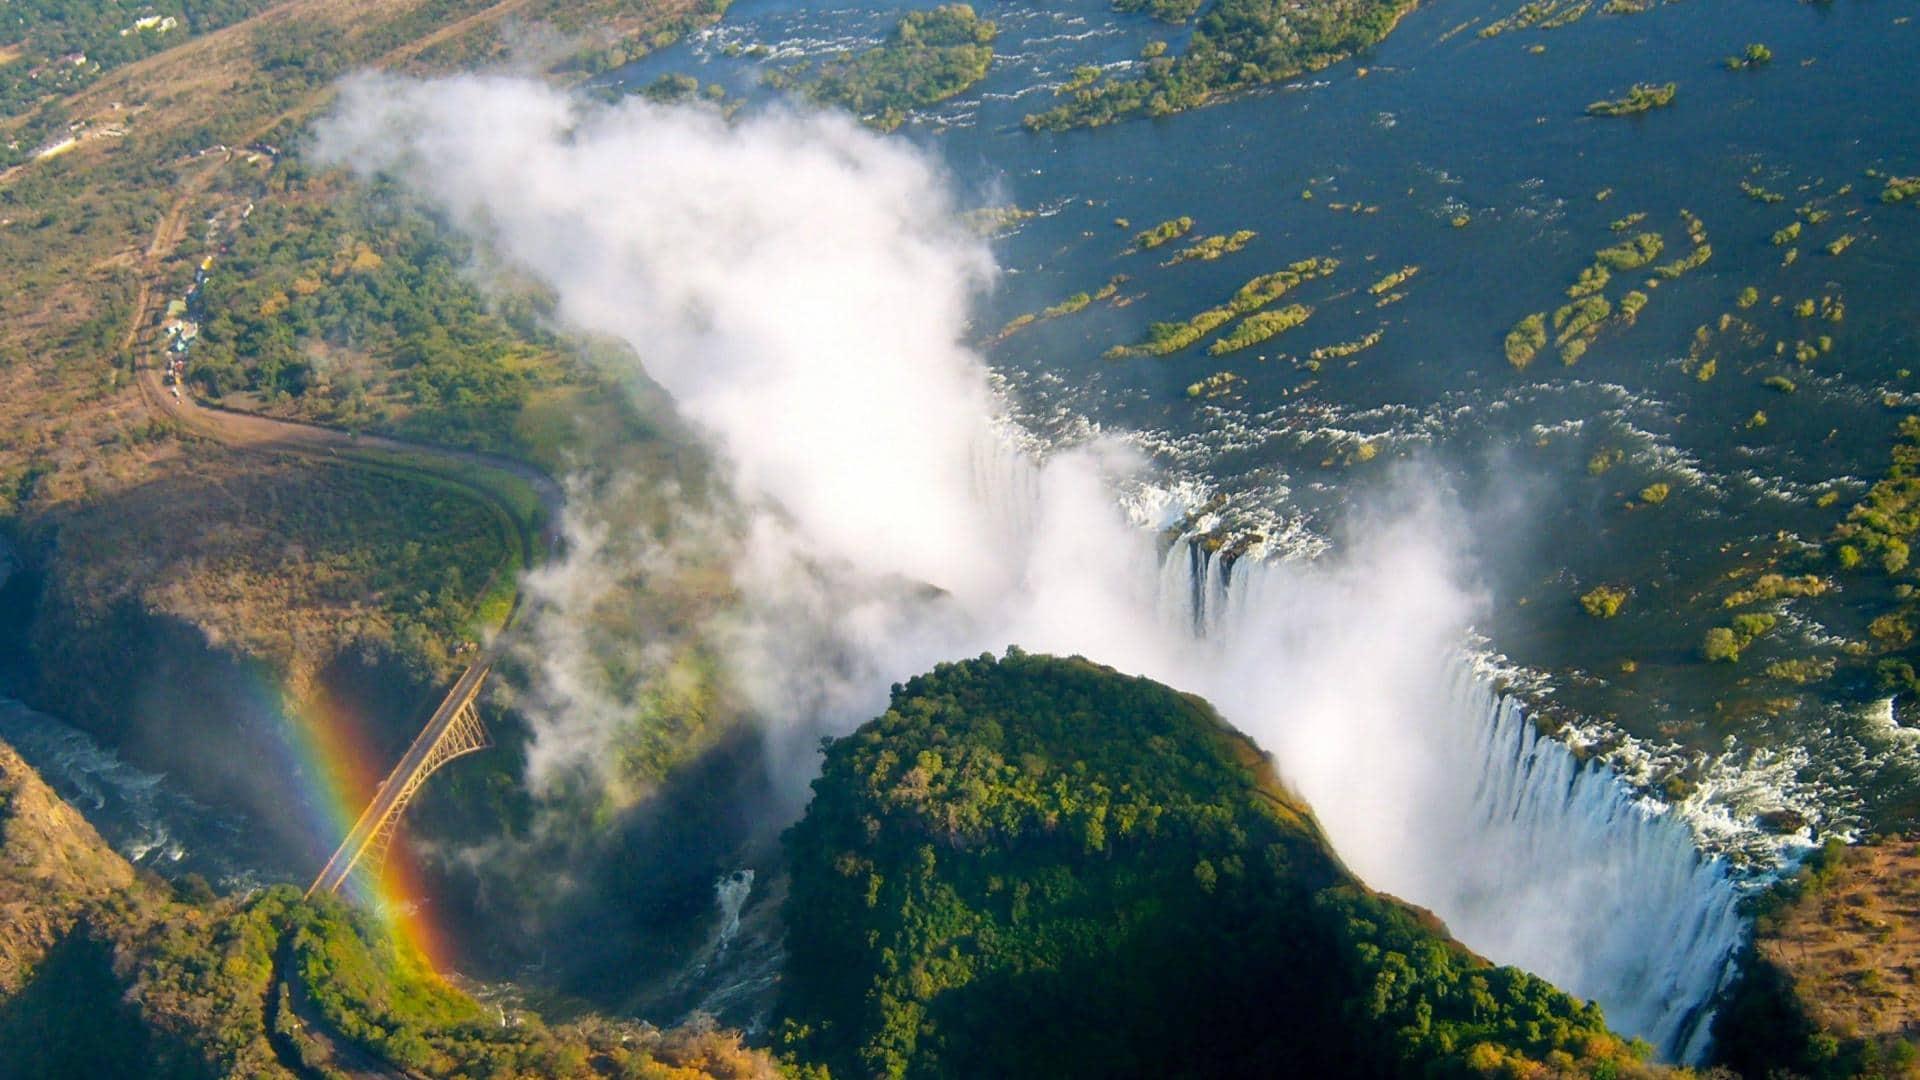 Wallpaper Natal Hd Victoria Falls Amp Zambian Big Game Safari 10 Days